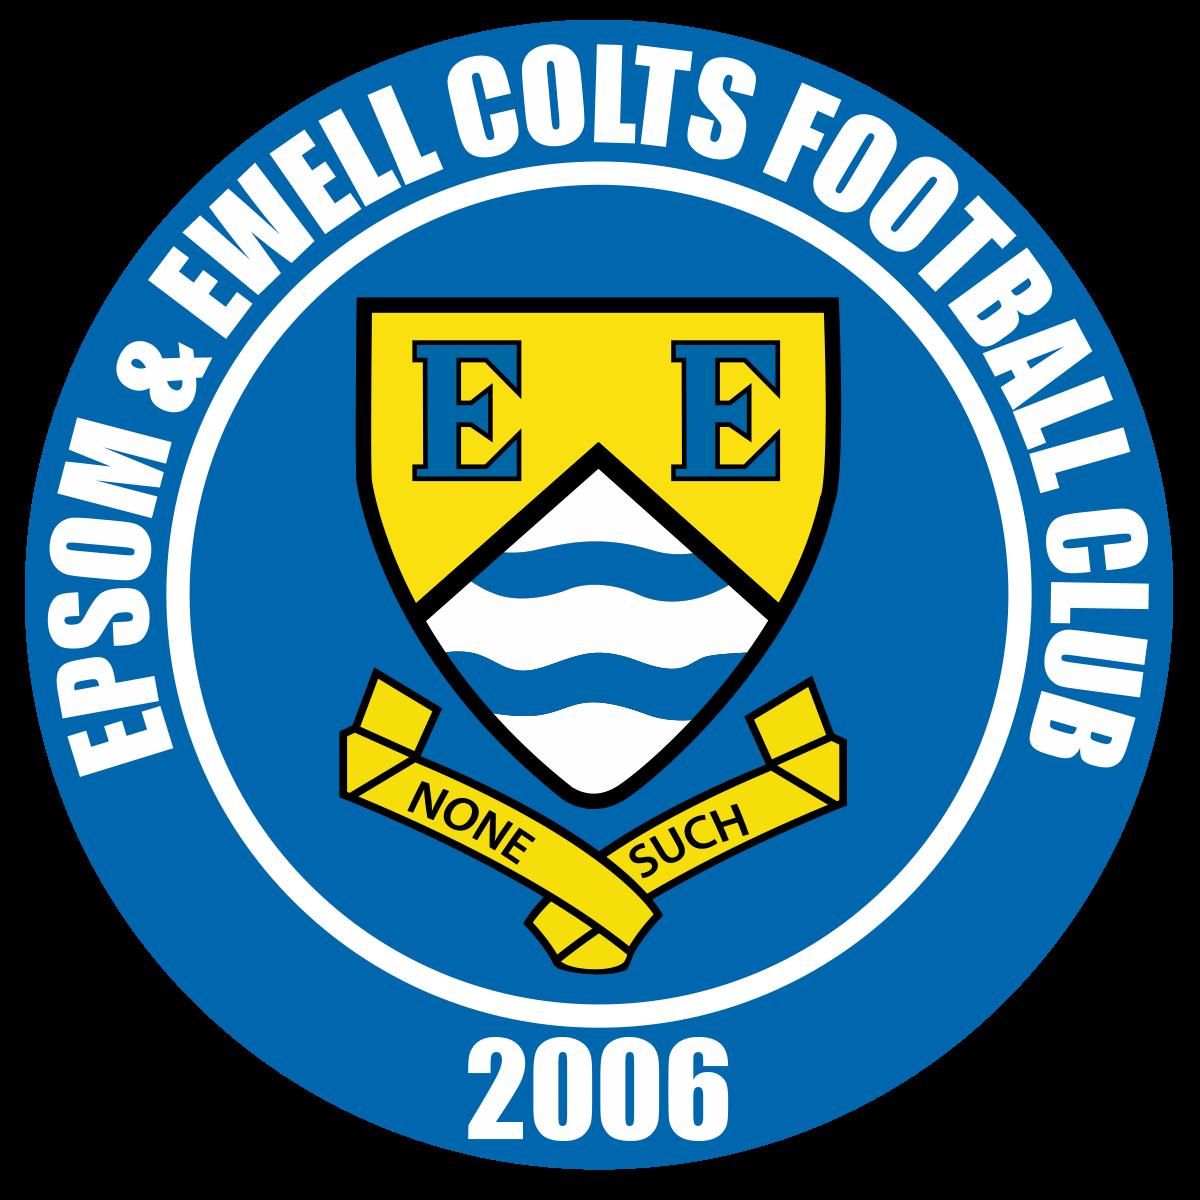 Epsom & Ewell Colts FC